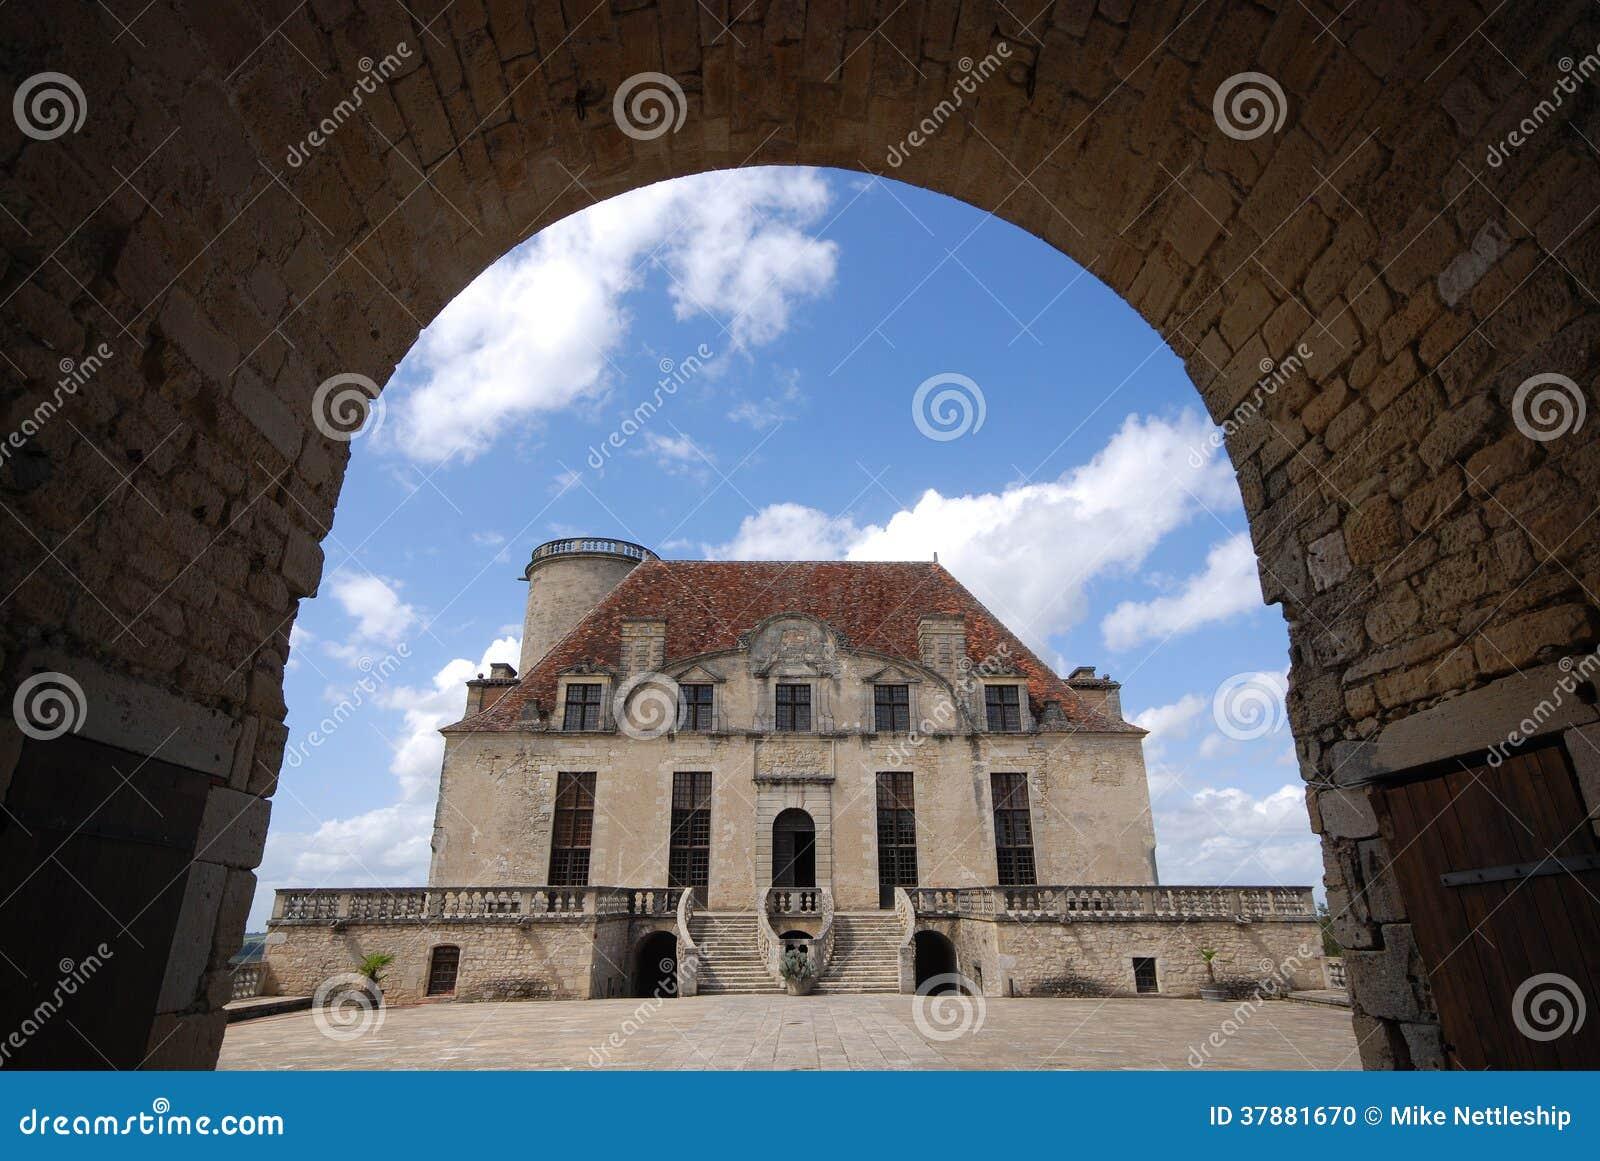 Franse chateau